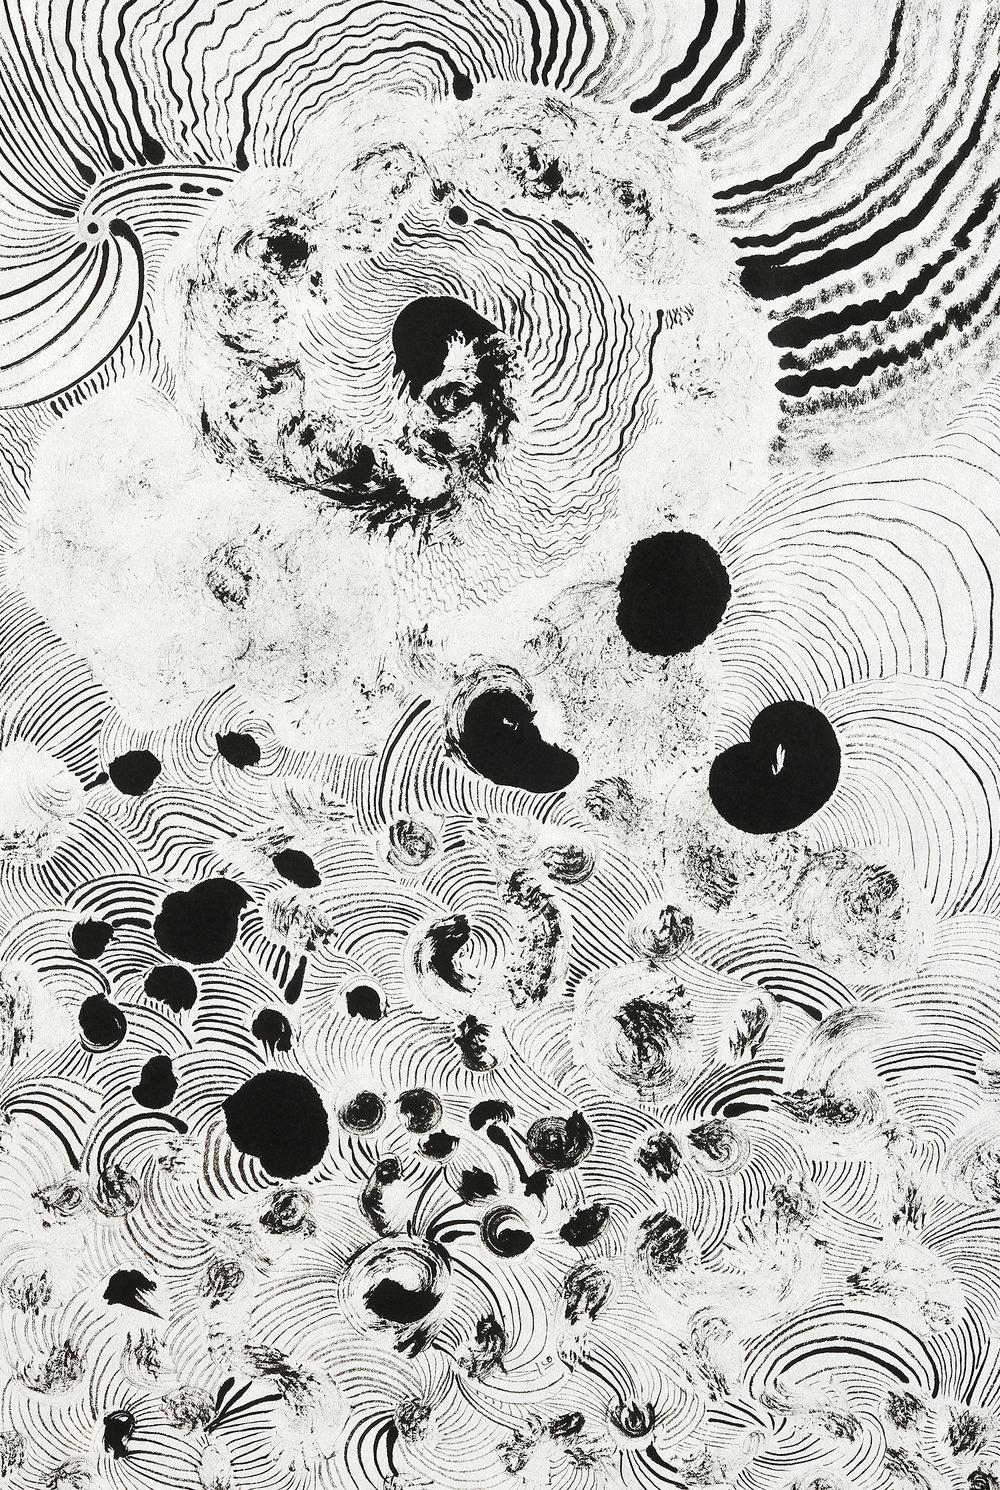 Cosmic Flow  sumi ink on paper  23x17in. 2016